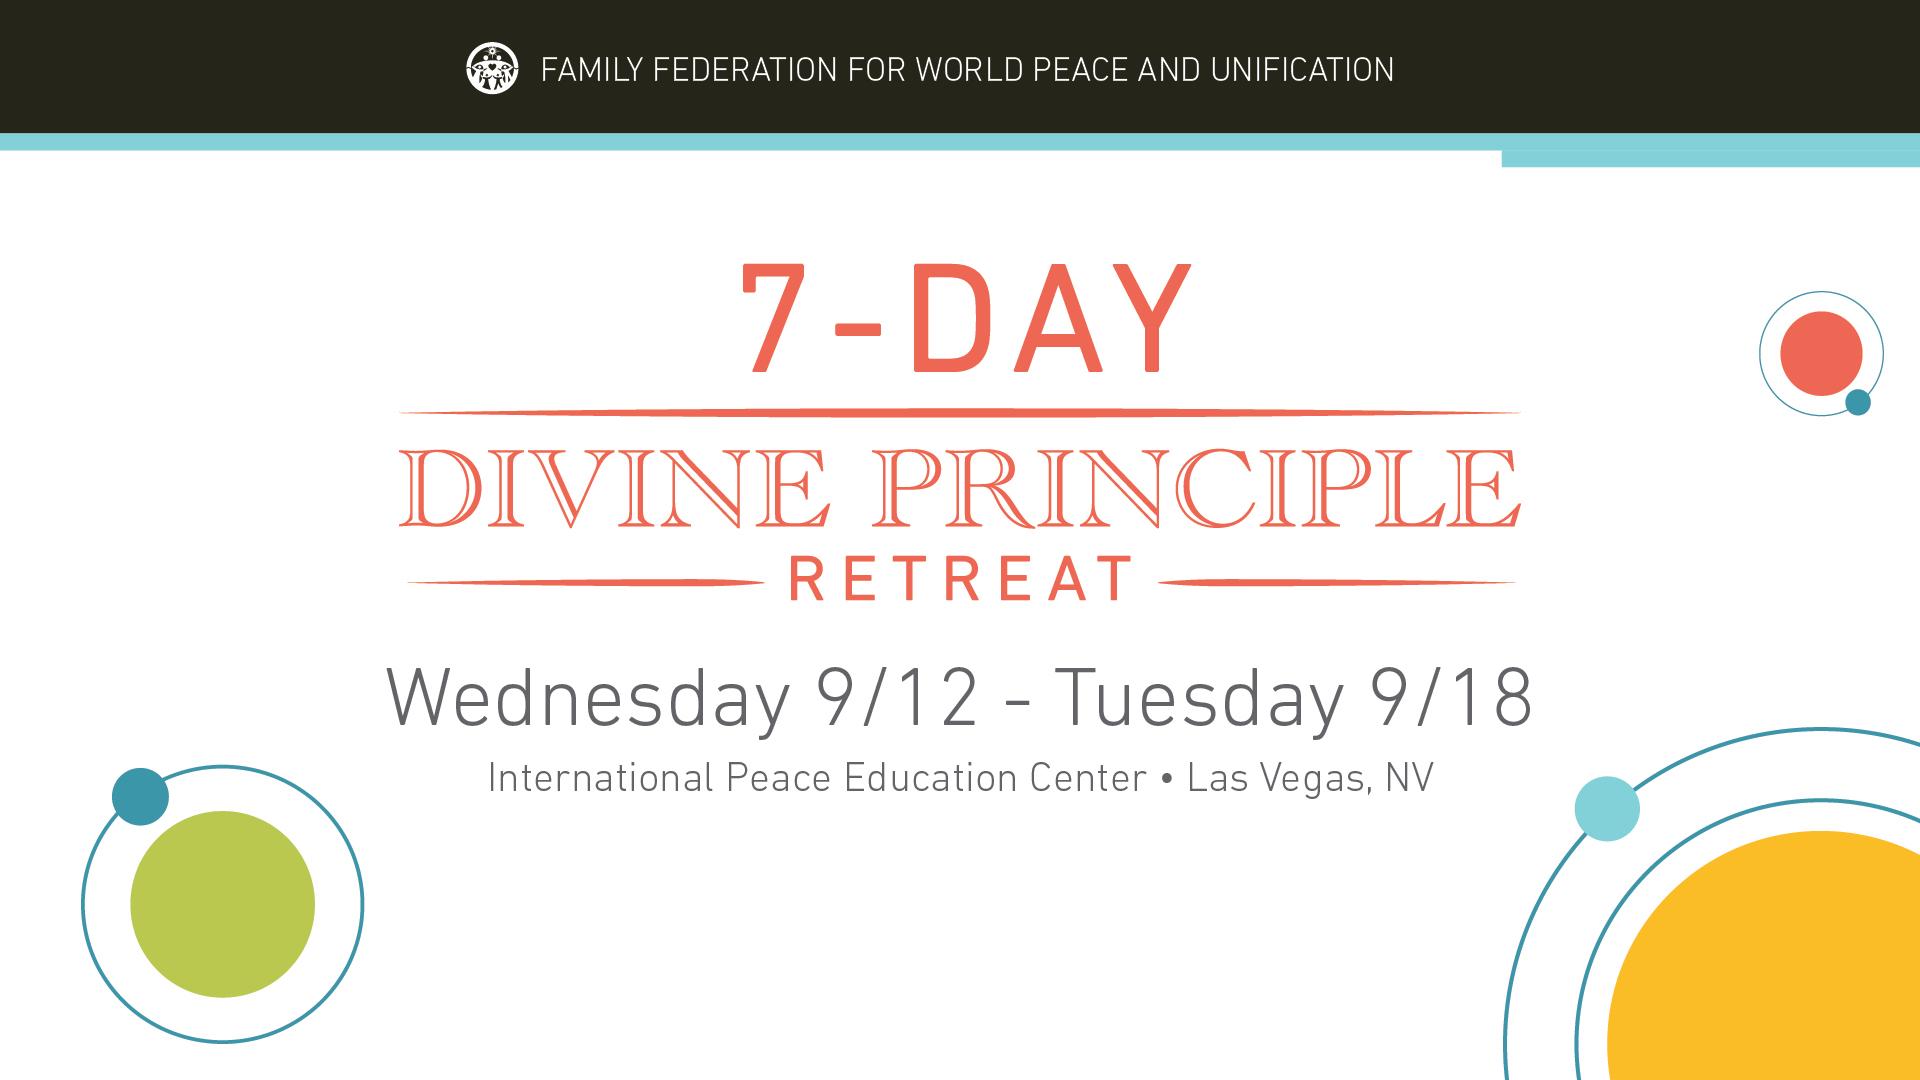 IPECDP-Retreat_Thumbnail_7-Day_9-12-18.jpg